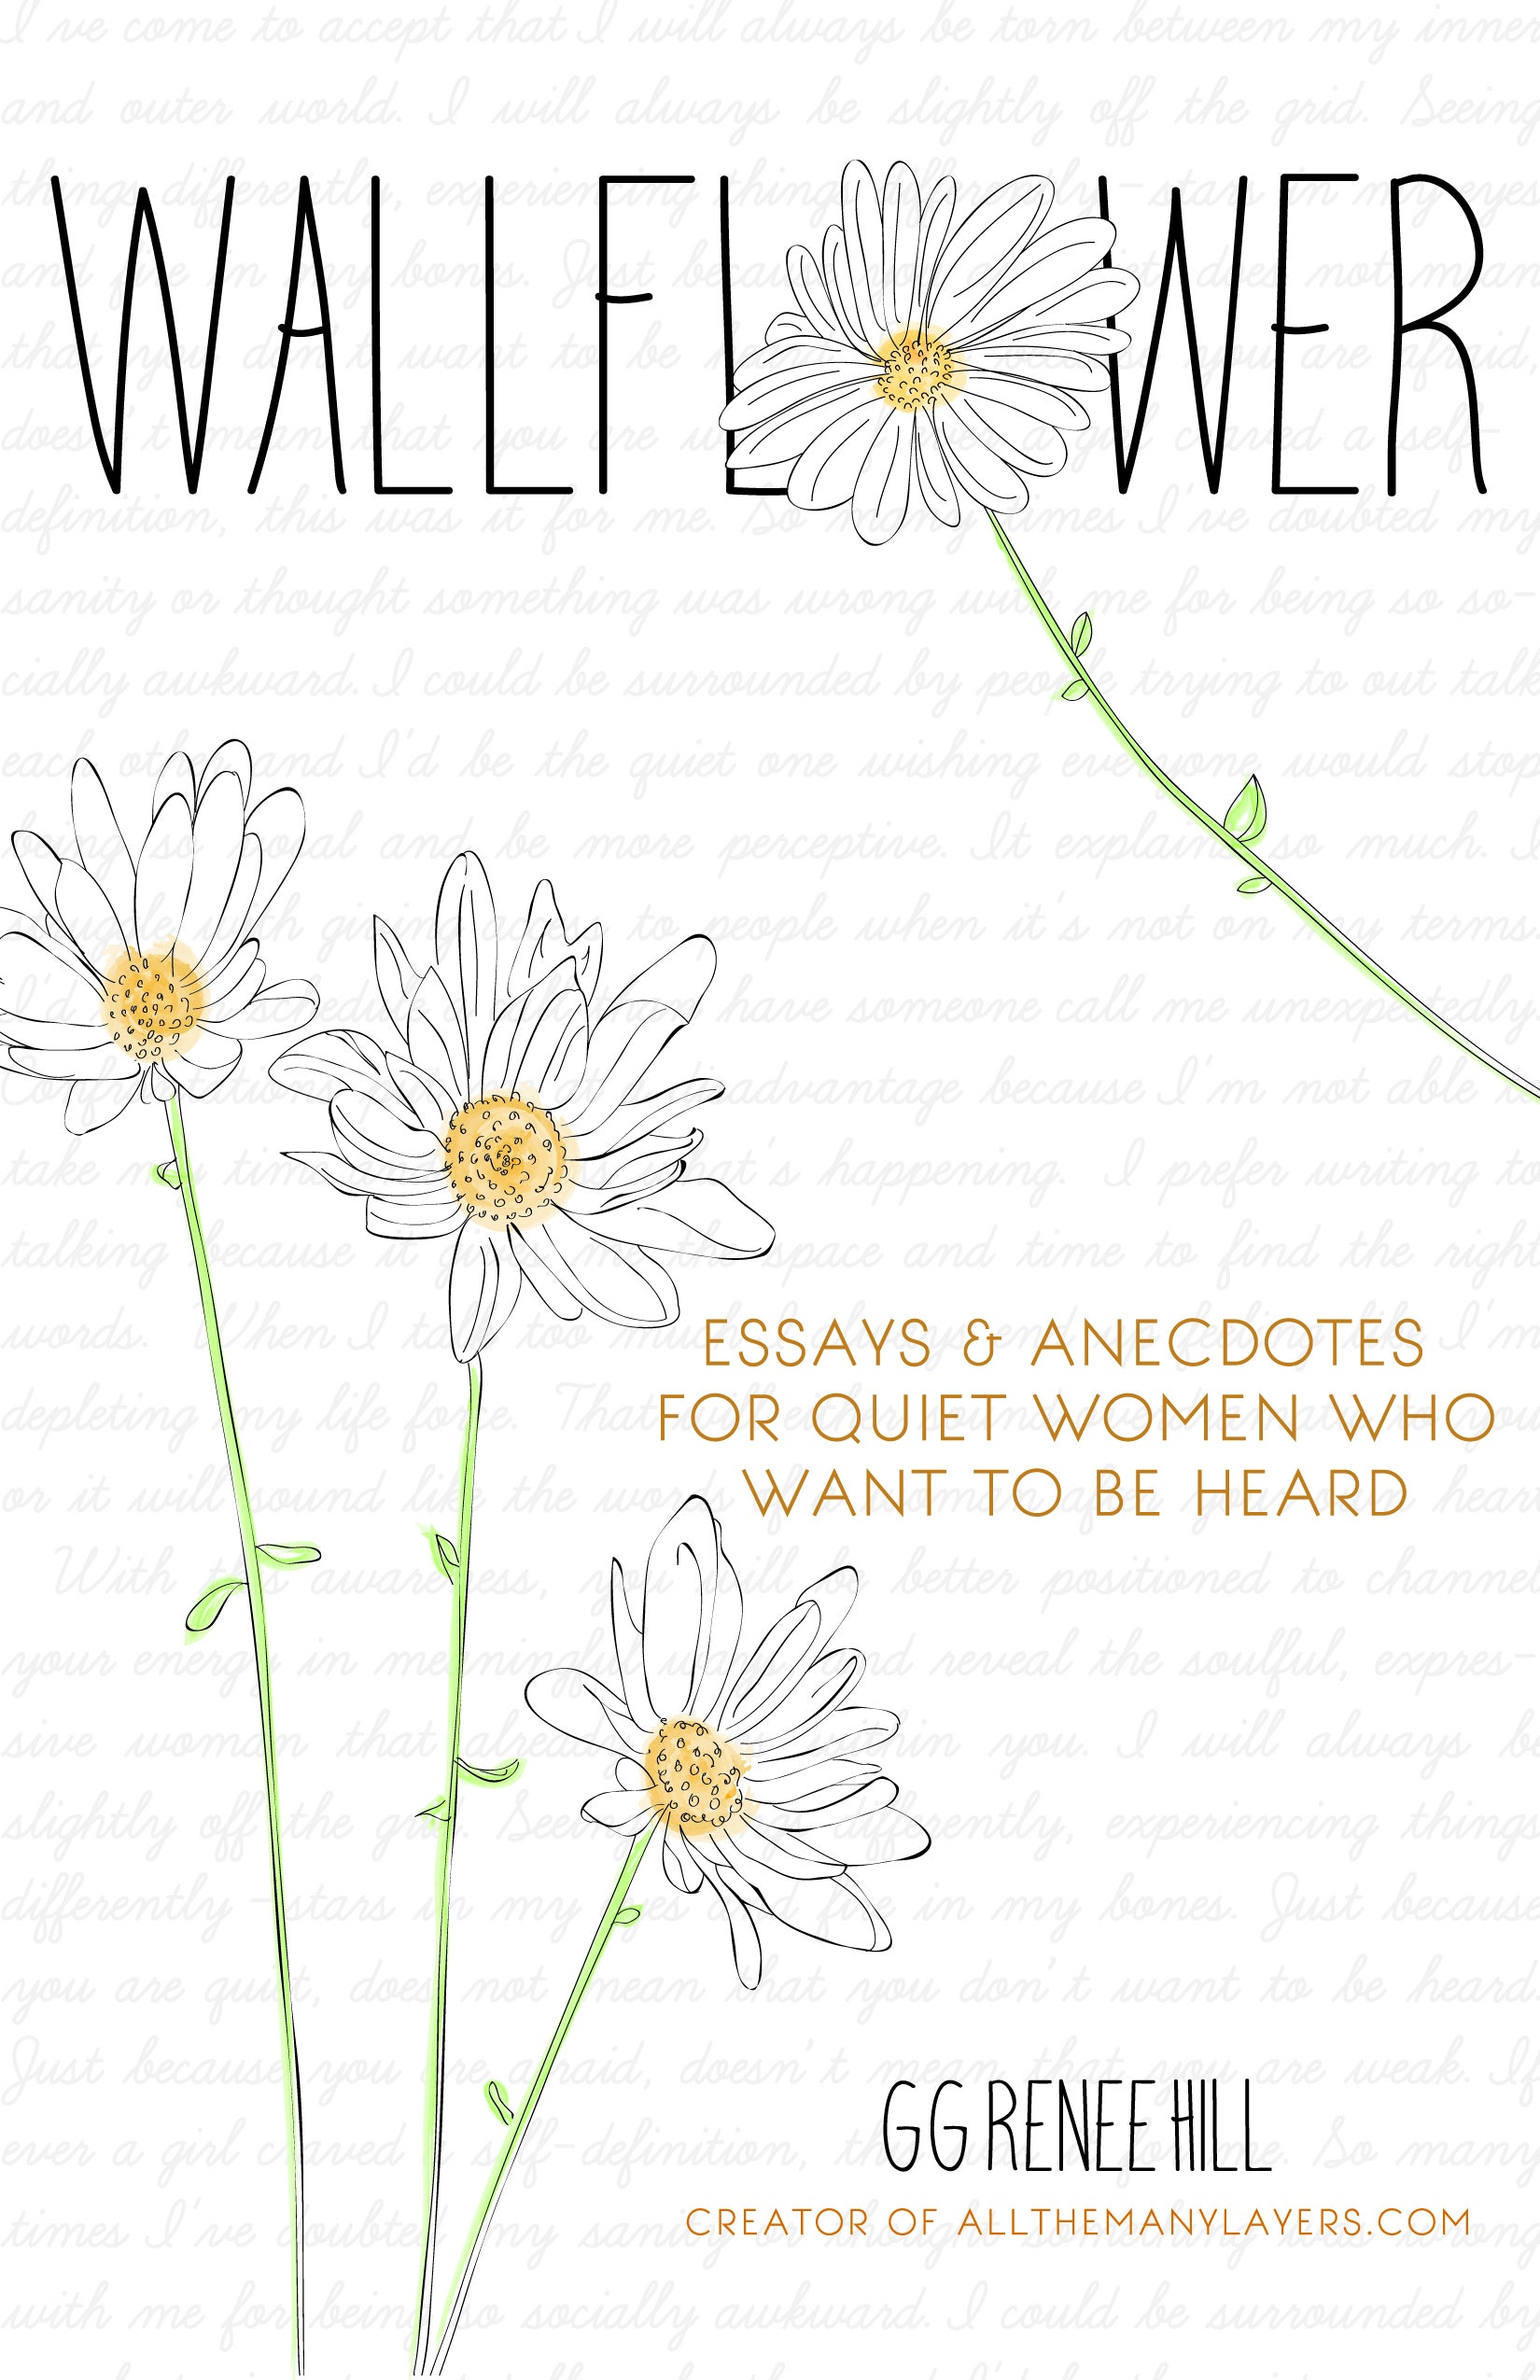 Anecdotes for essays